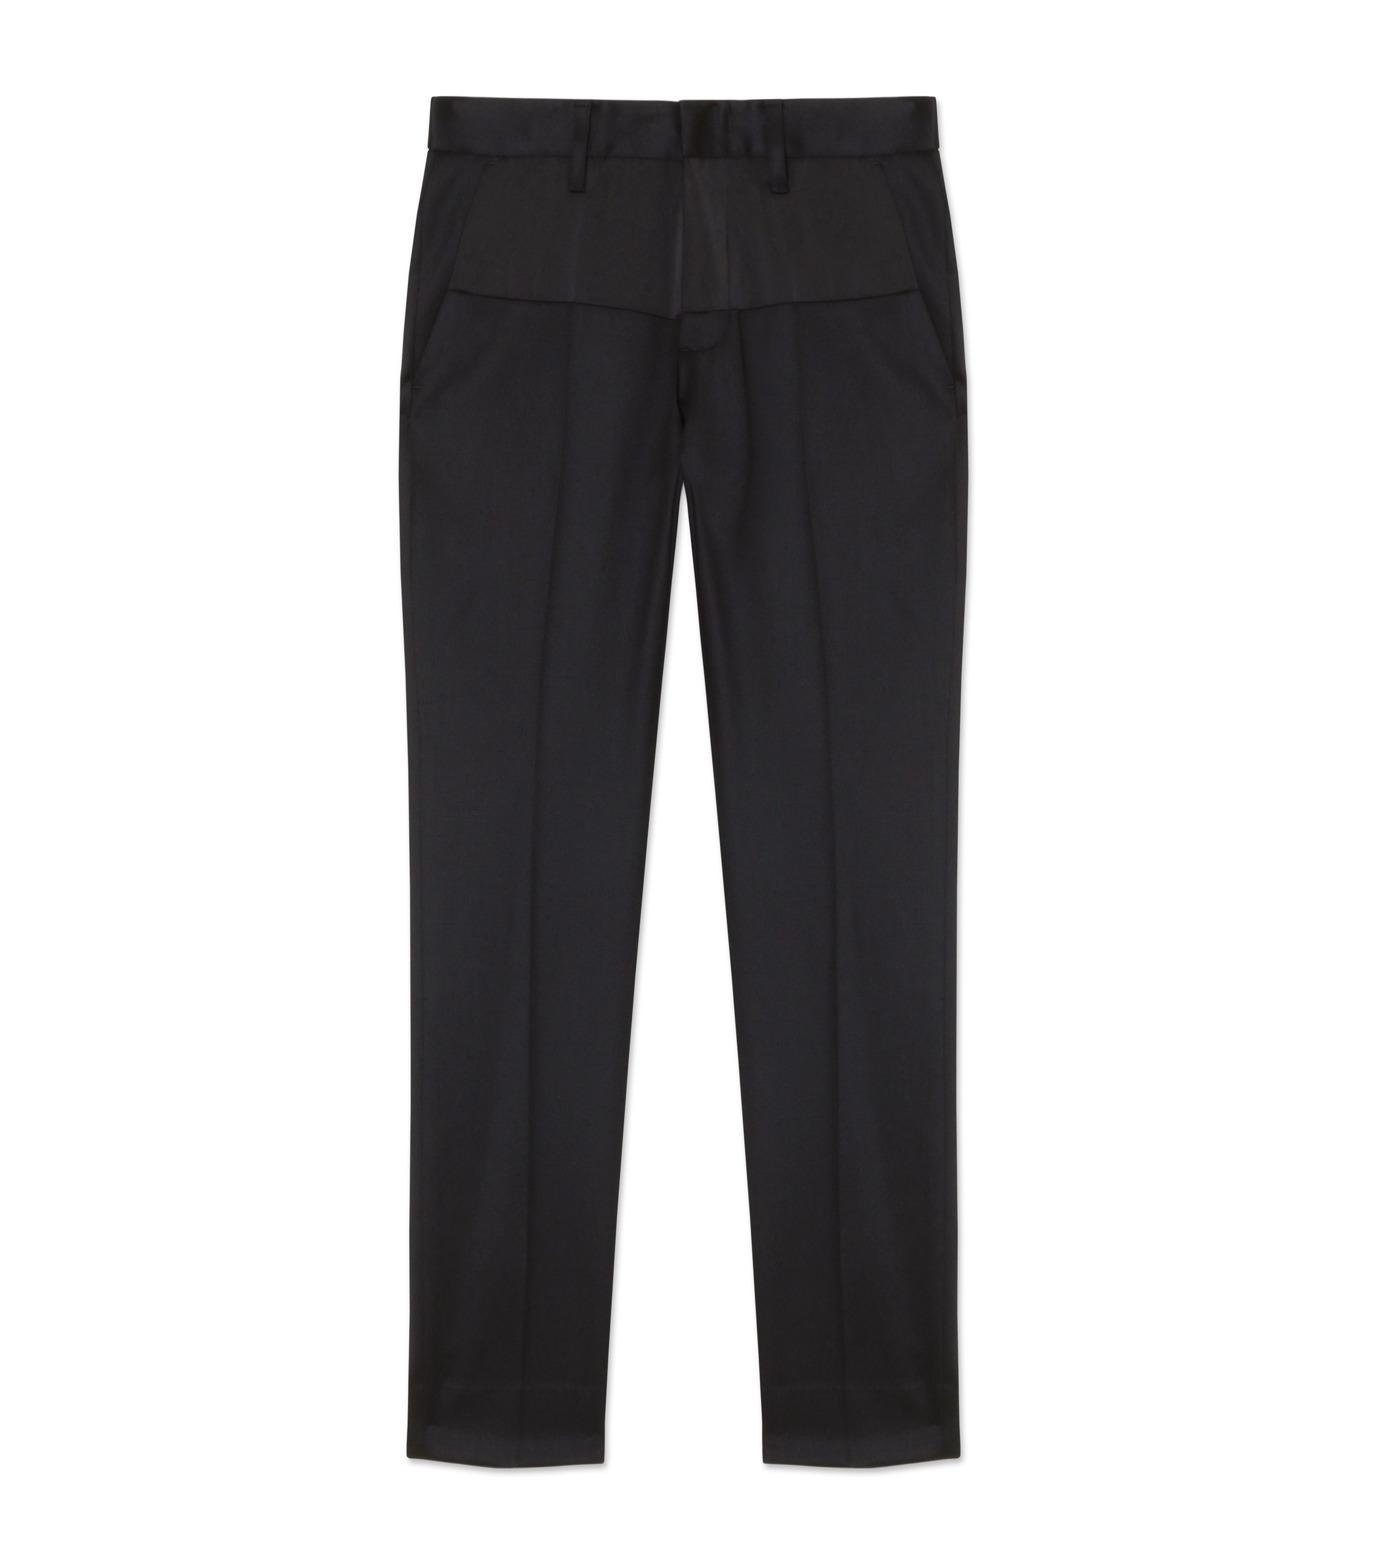 liberum arbitrium(リベルム アルビトリウム)のSatin Skinny Slacks-BLACK(パンツ/pants)-2016AW-PT01-13 拡大詳細画像1